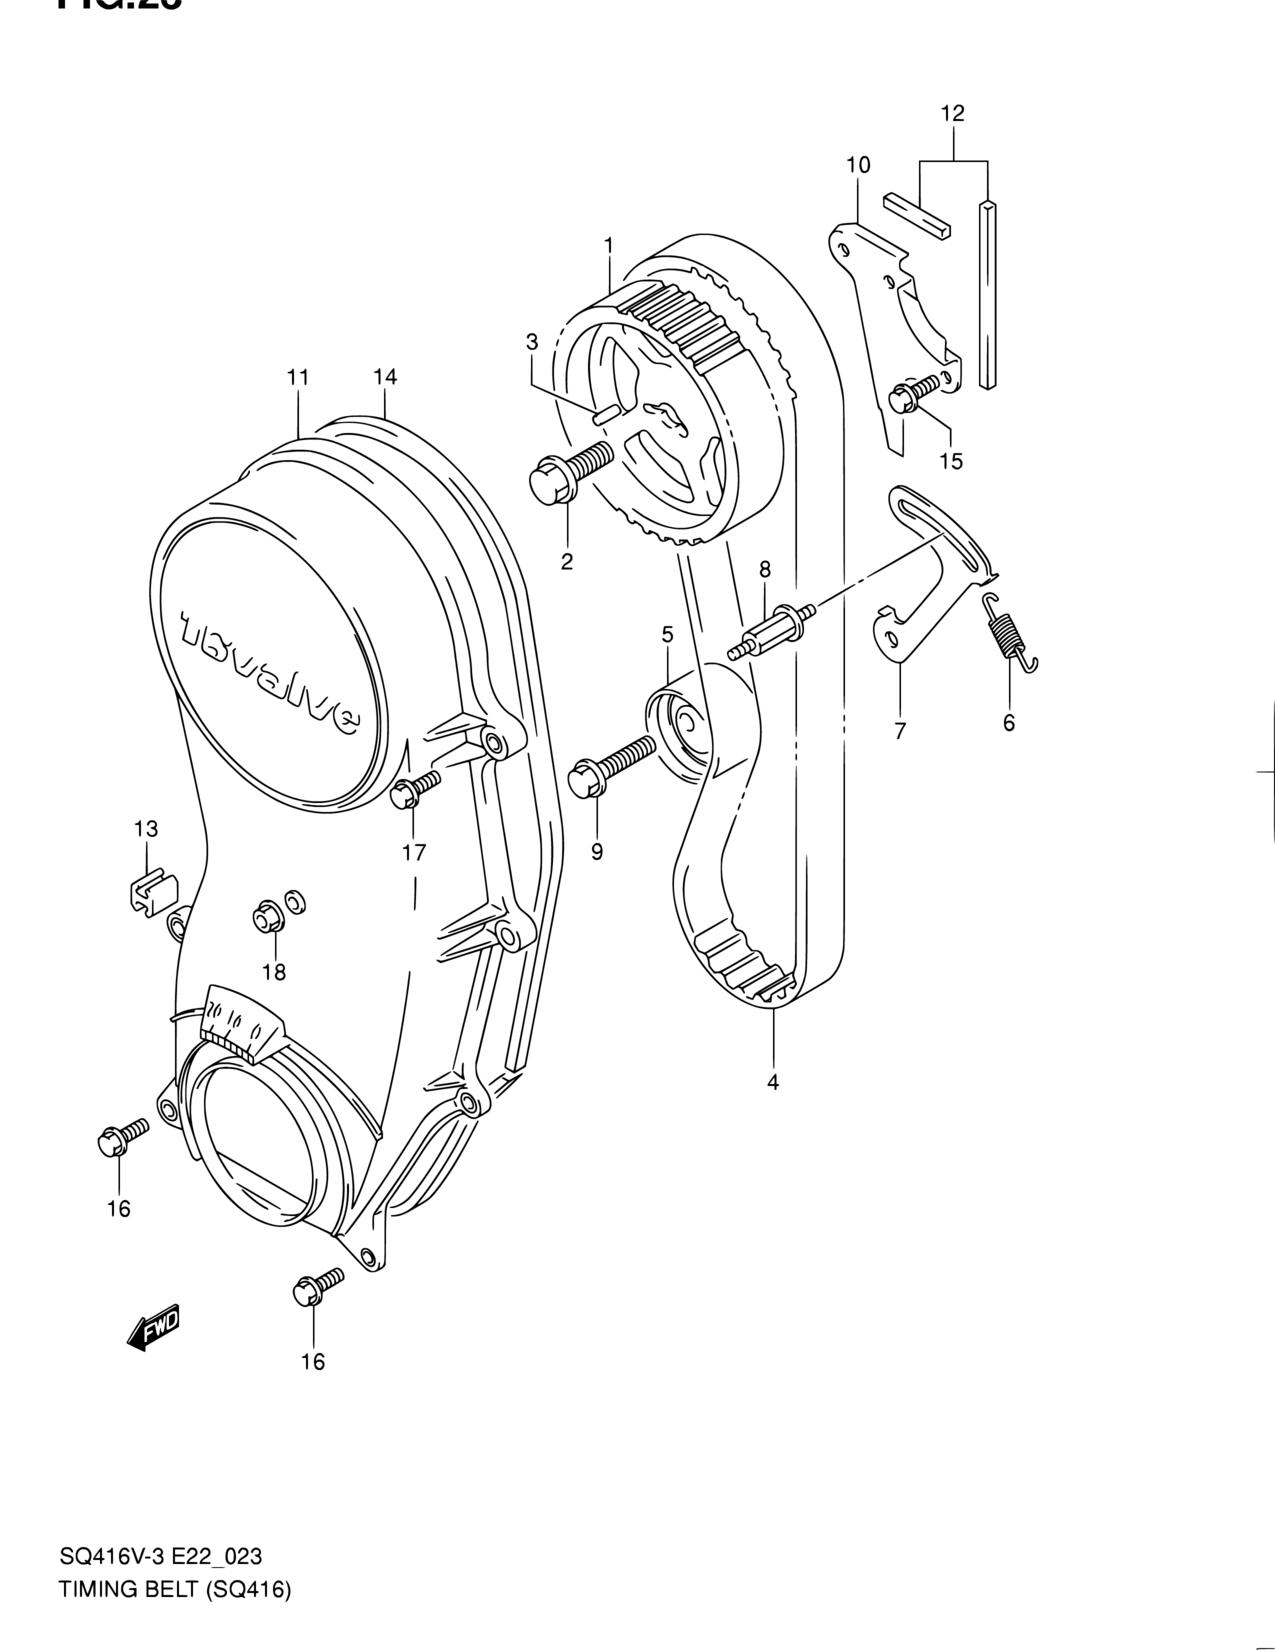 2007 Suzuki Forenza Timing Belt Diagram For Reno All Regions Grand Vitara Engine 1275x1650